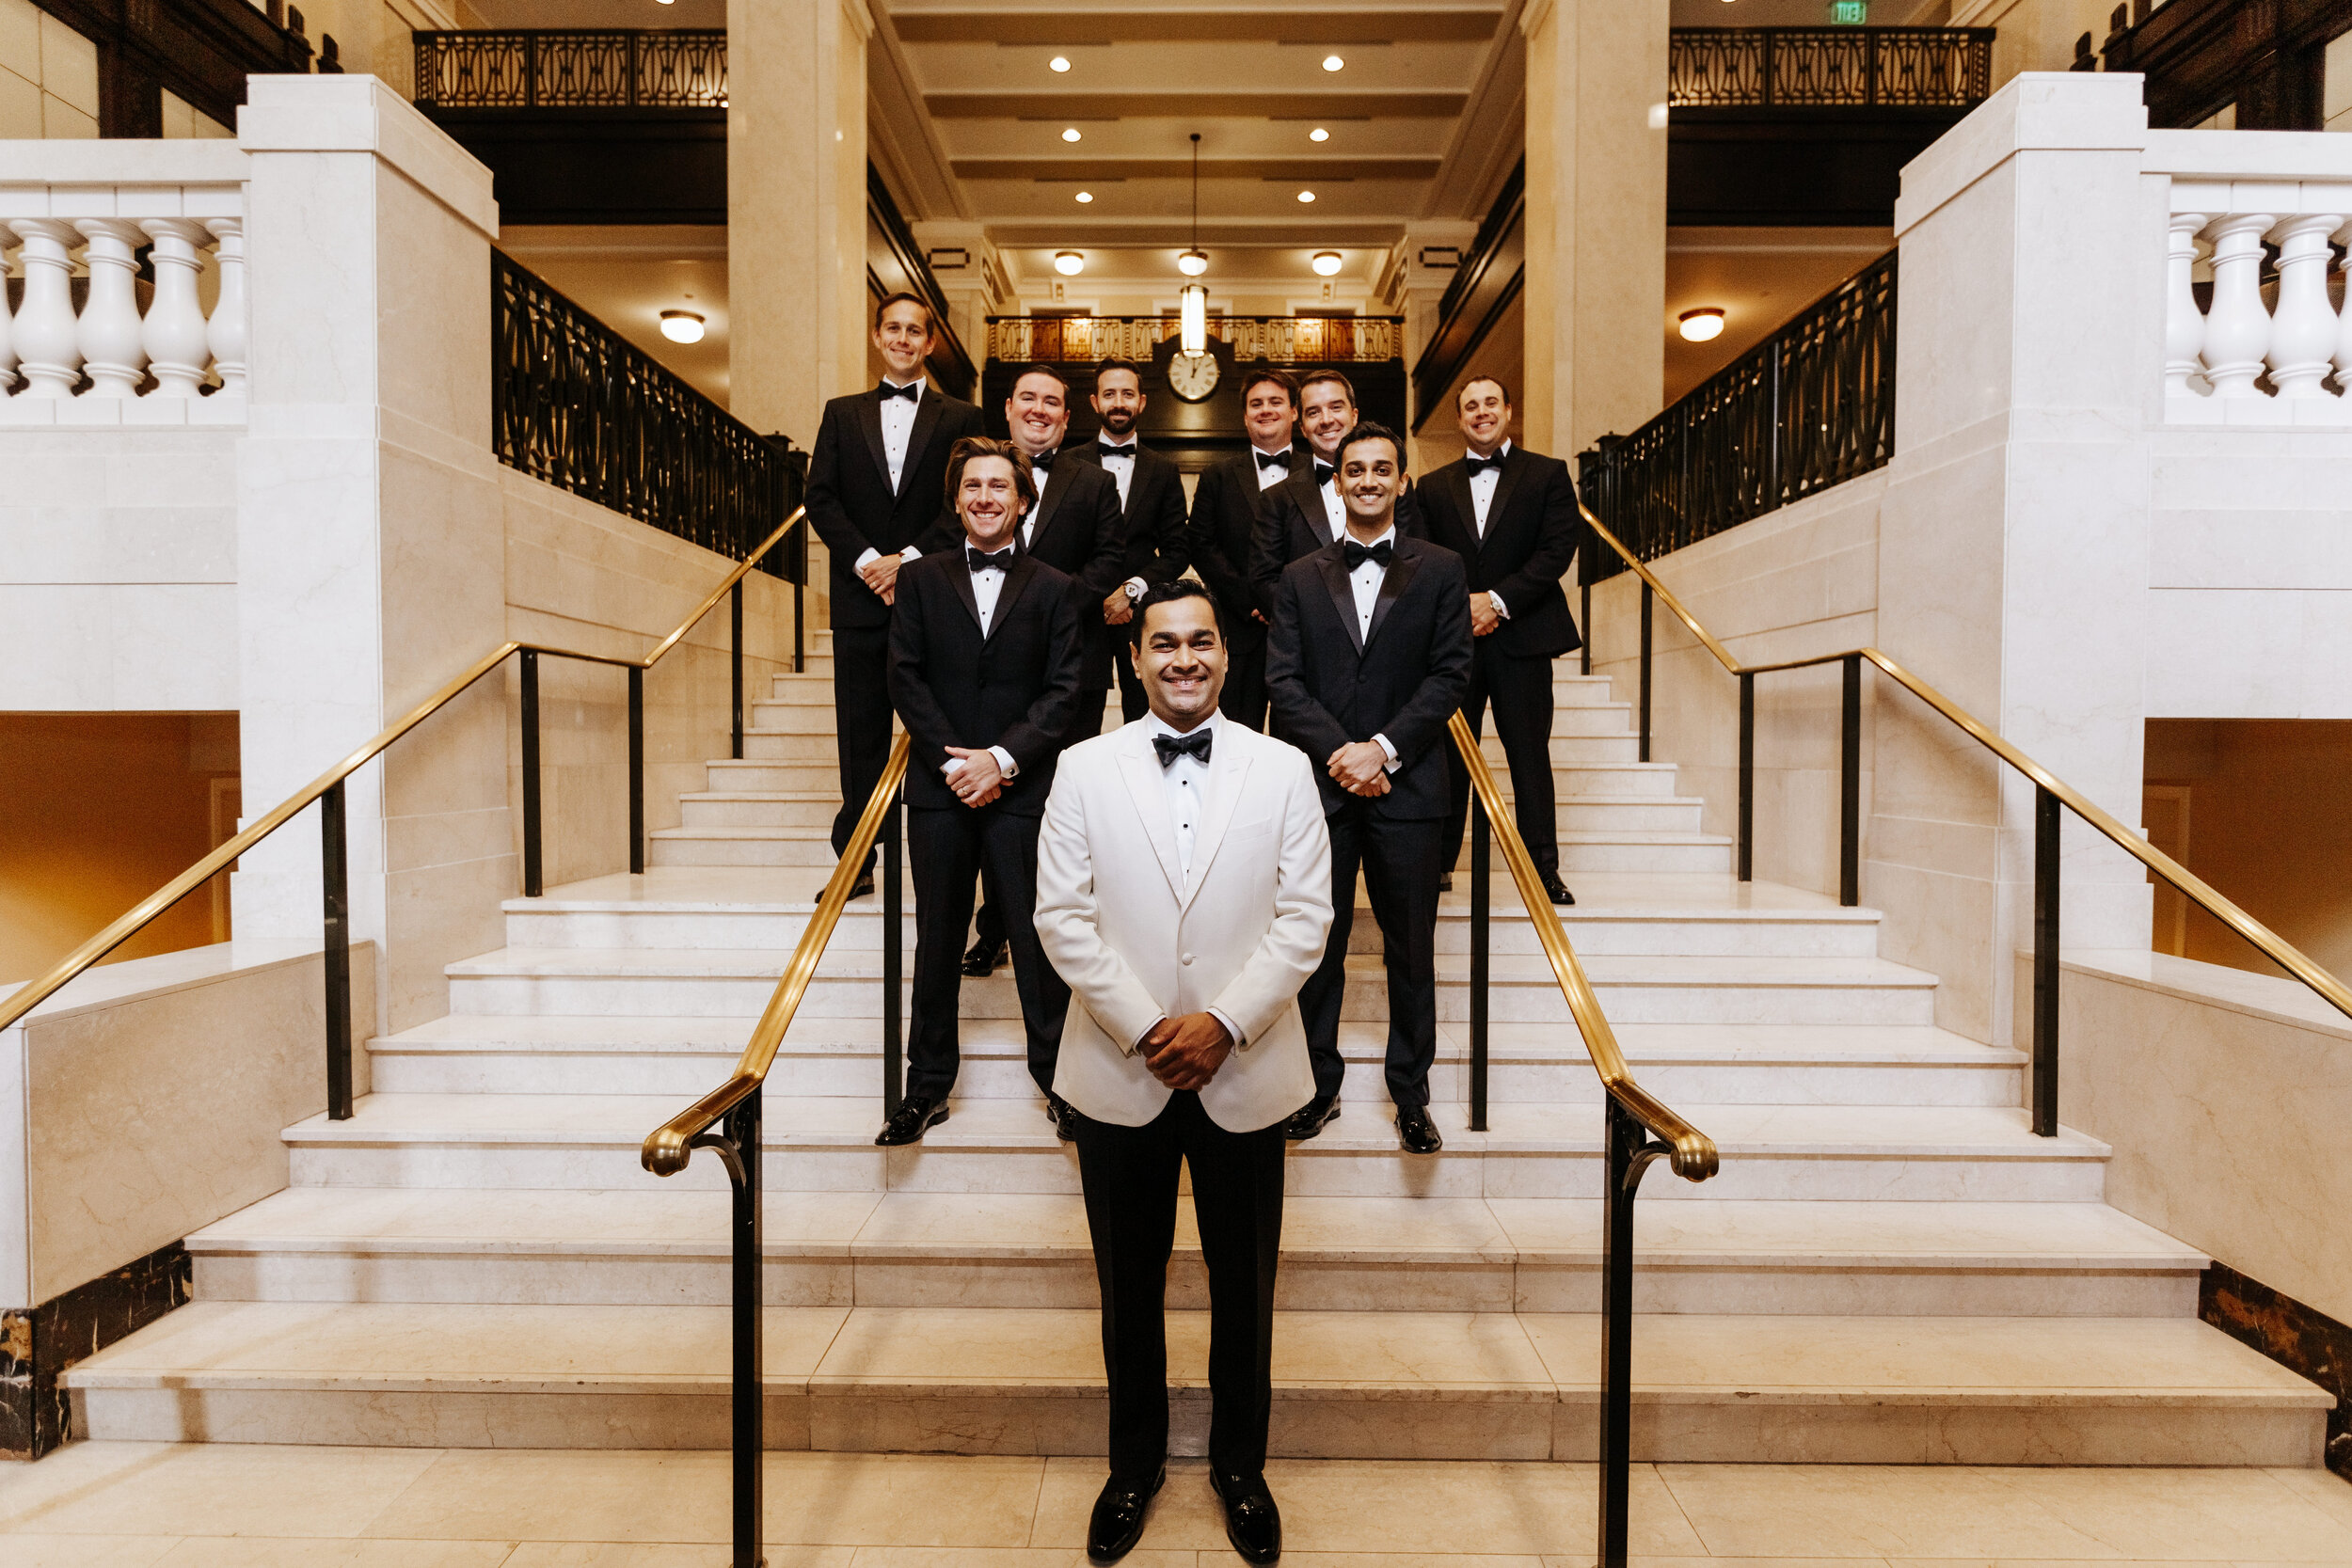 Cassie-Mrunal-Wedding-Quirk-Hotel-John-Marshall-Ballrooms-Richmond-Virginia-Photography-by-V-29.jpg